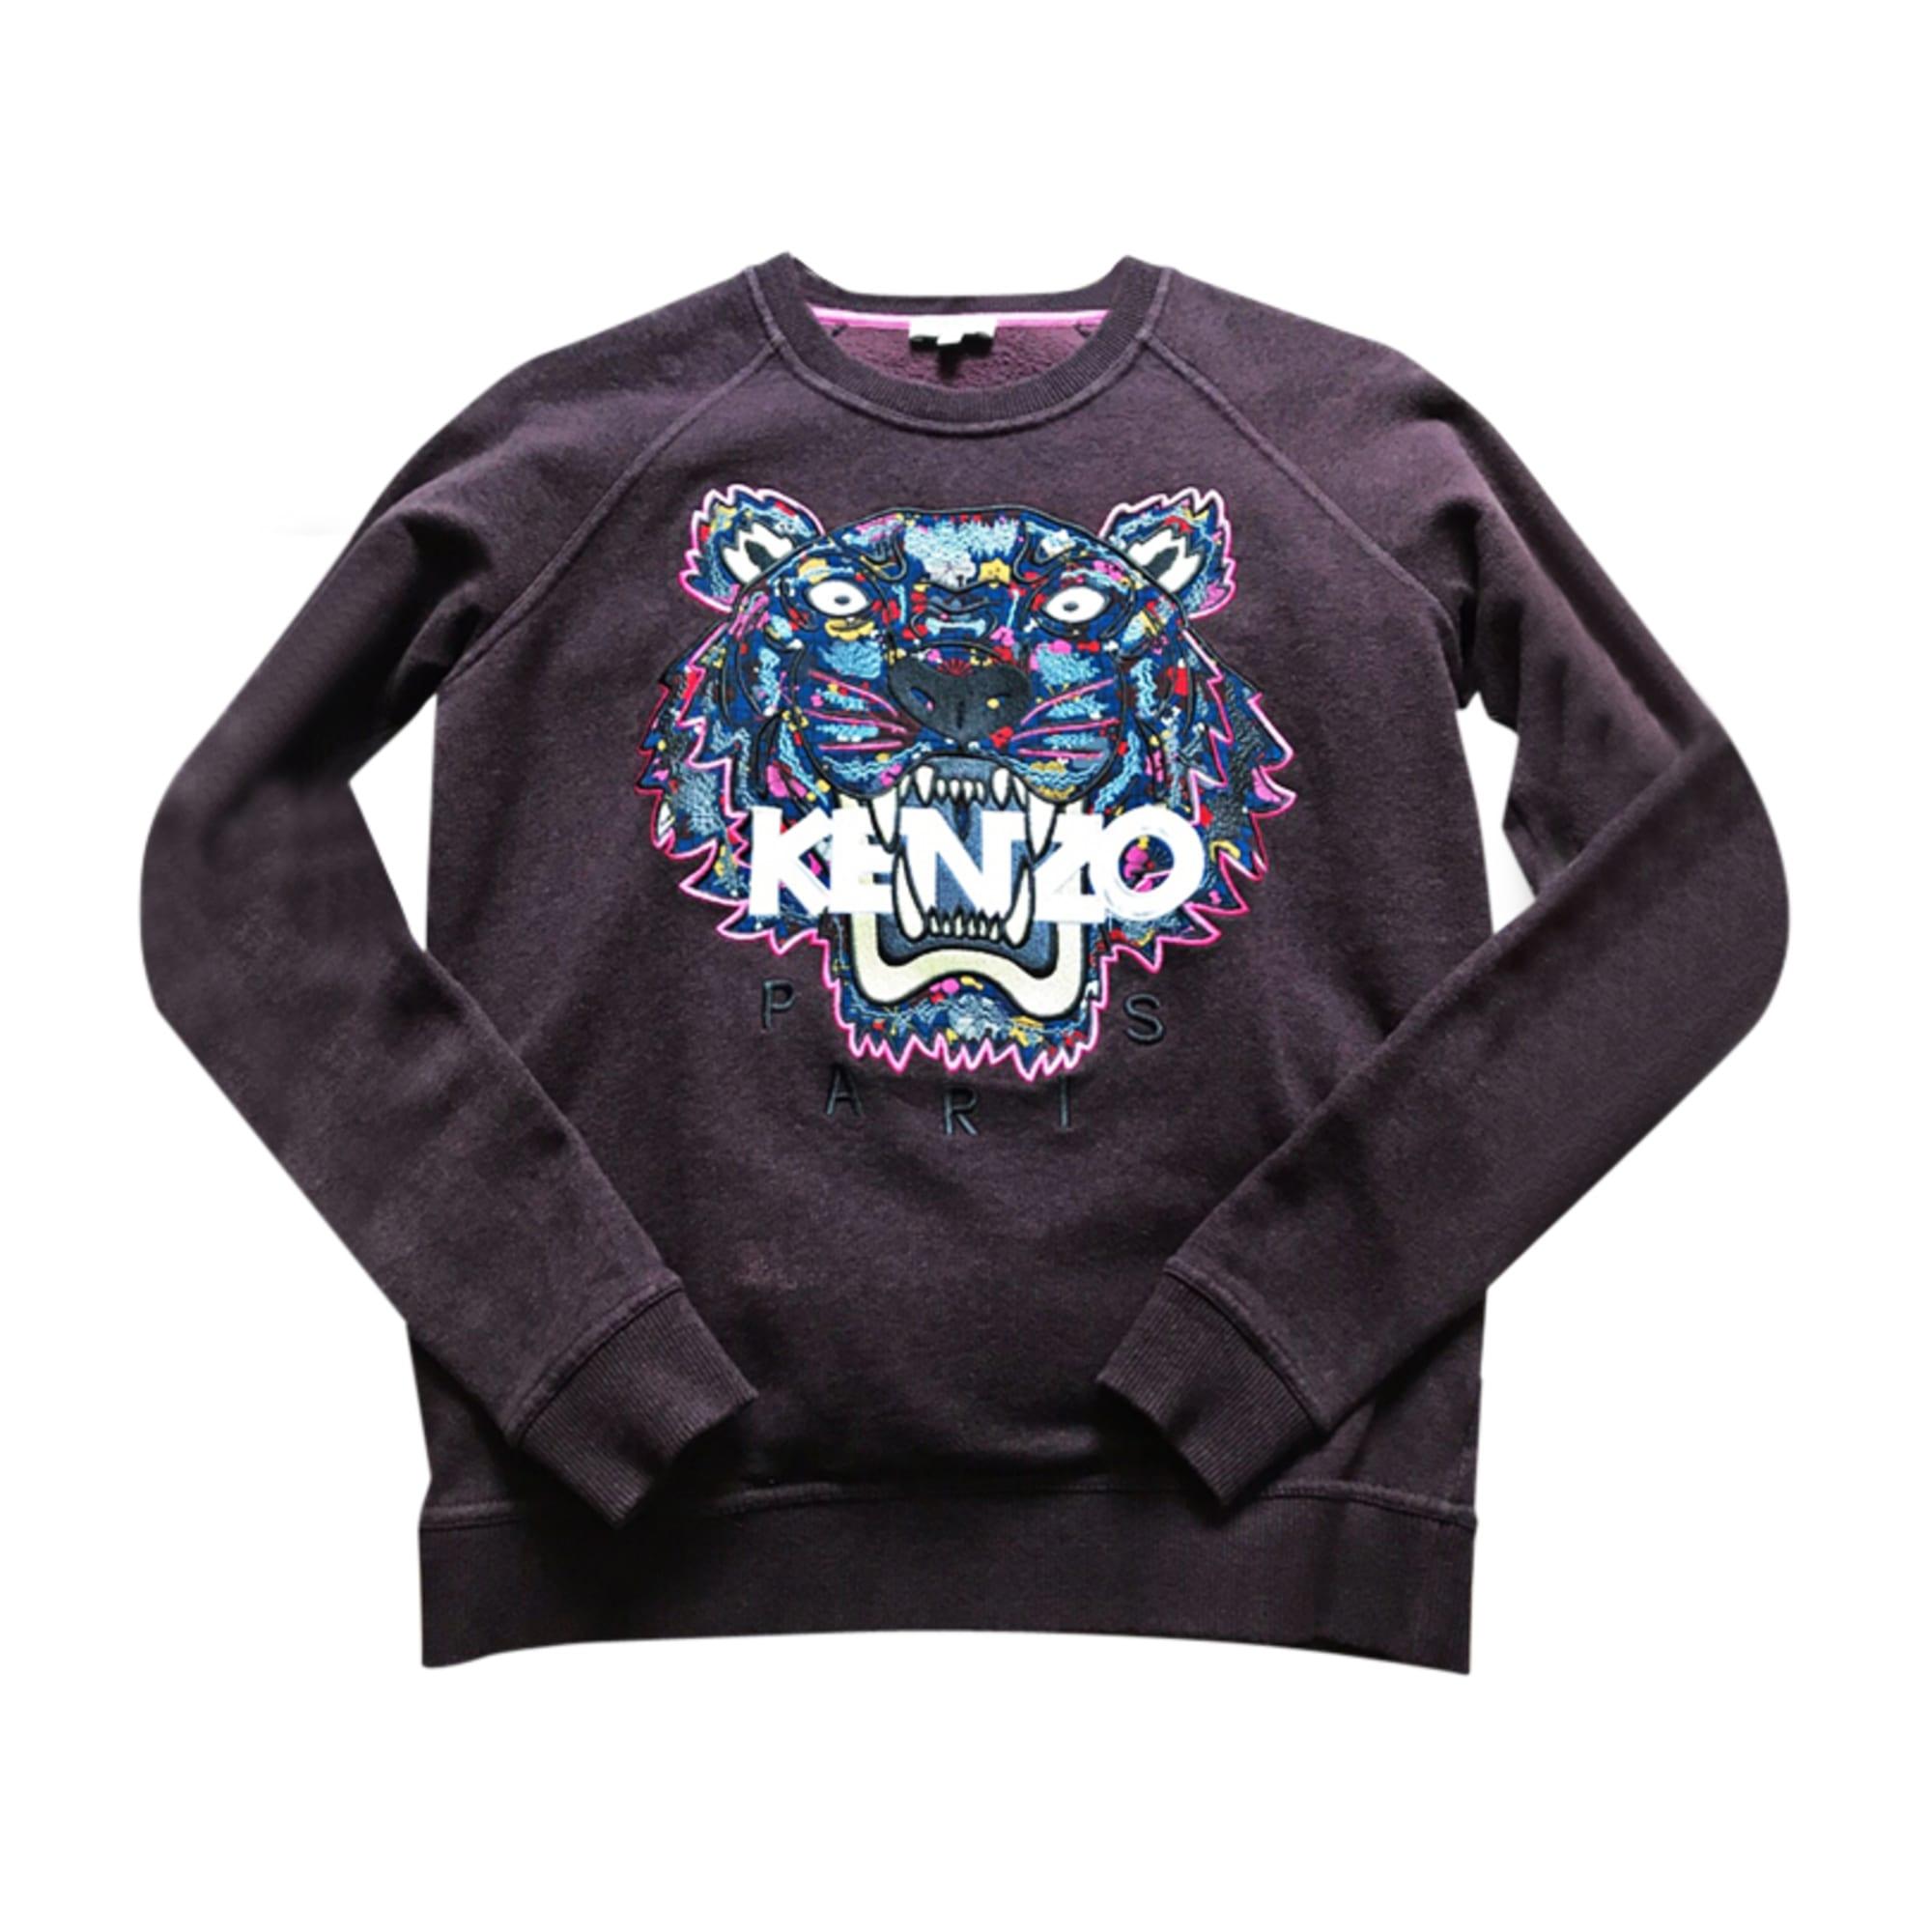 Kenzo 34 Violet Sweat T0 8126618 xs 0gRw6